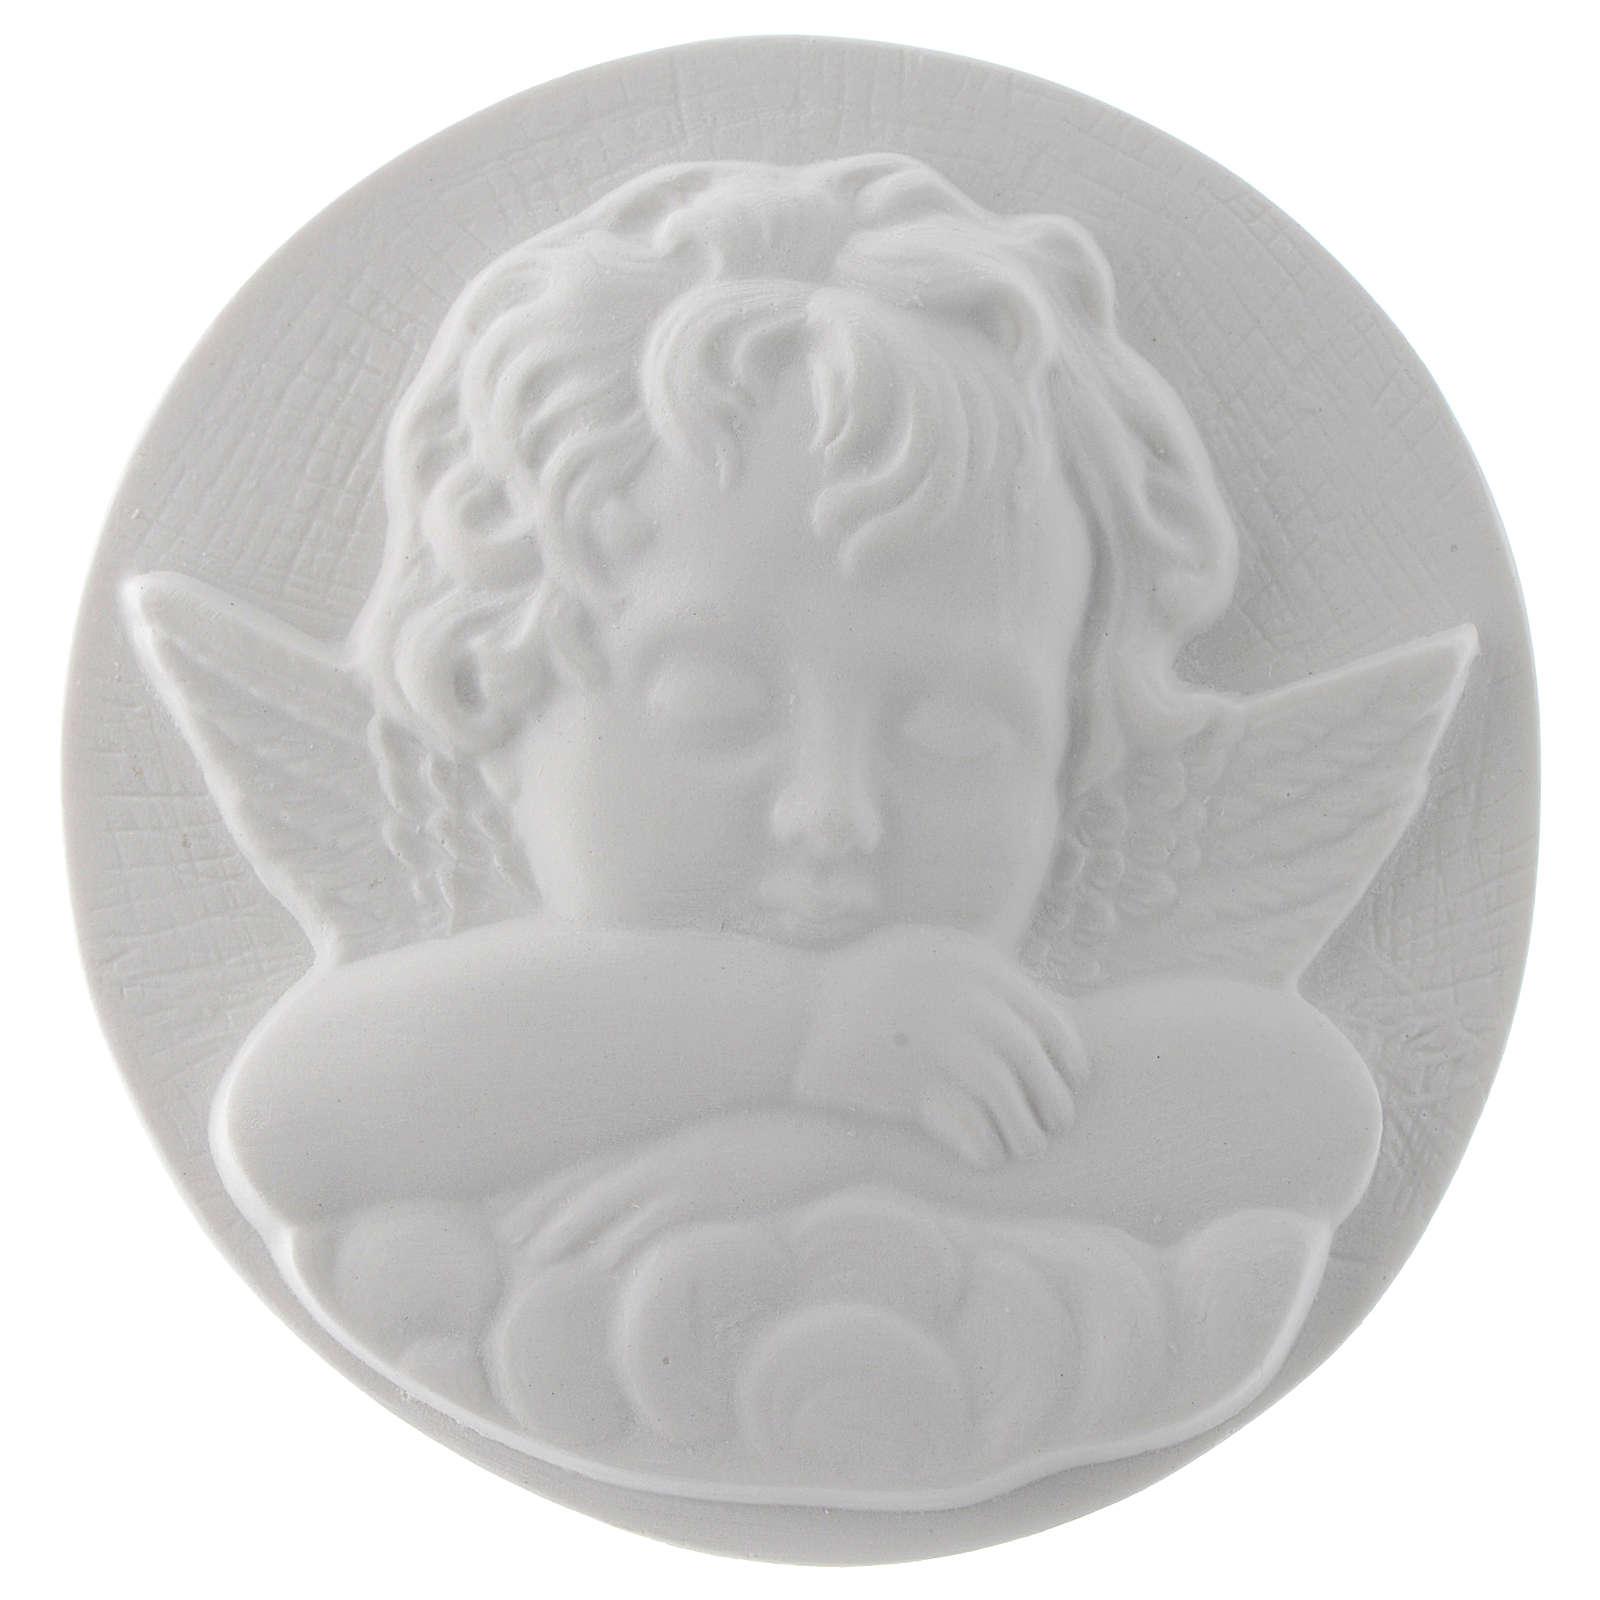 Angioletto dormiente tondo cm 11 rilievo marmo 3